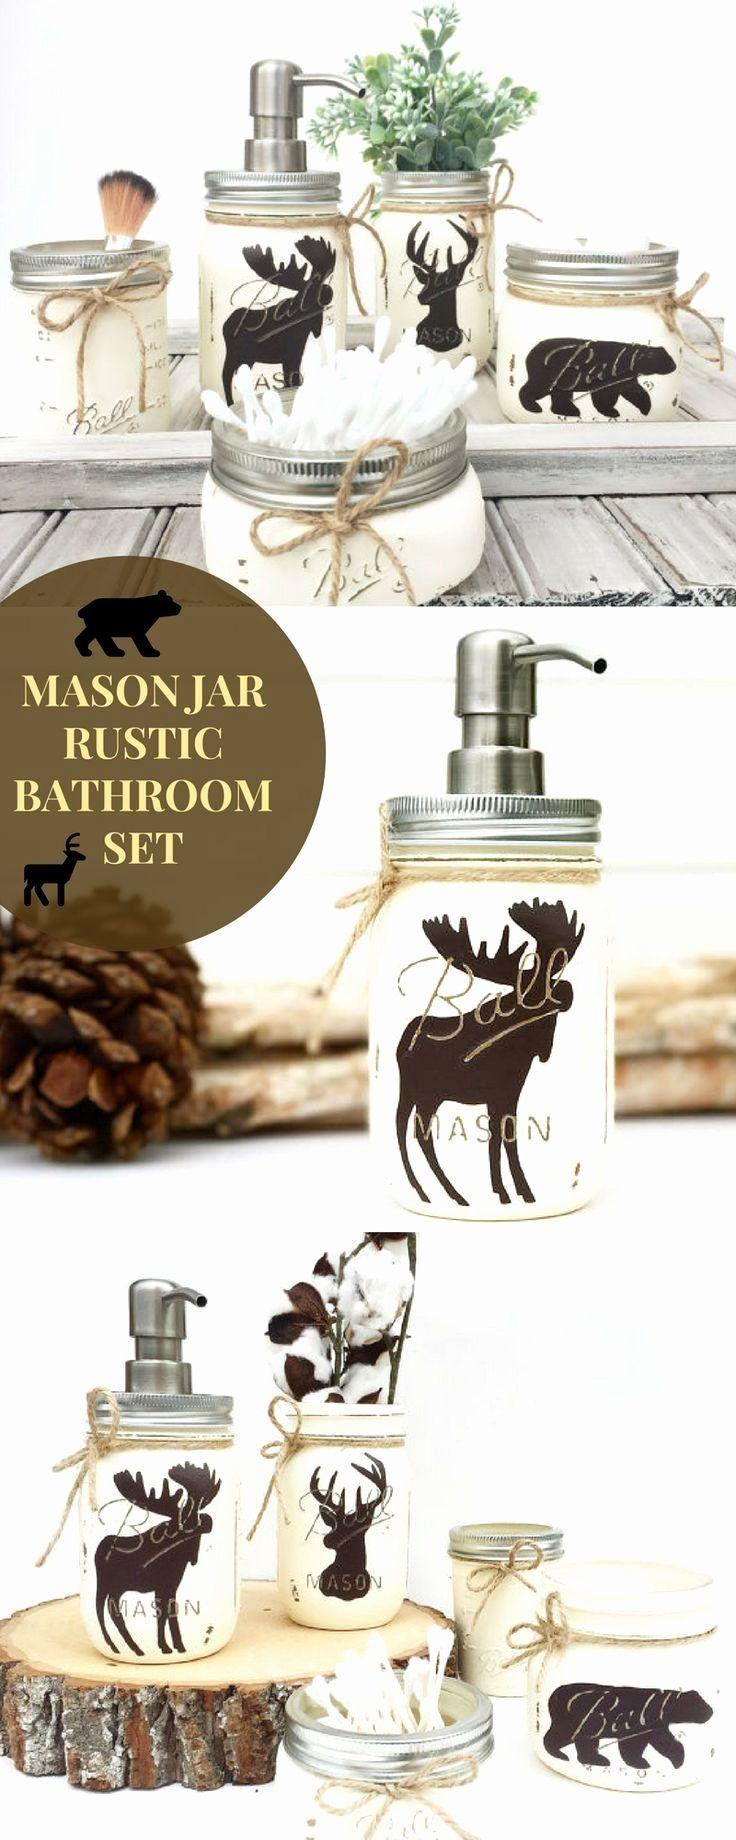 Bear and Moose Bathroom Decor Lovely Mason Jar Bathroom Set Rustic